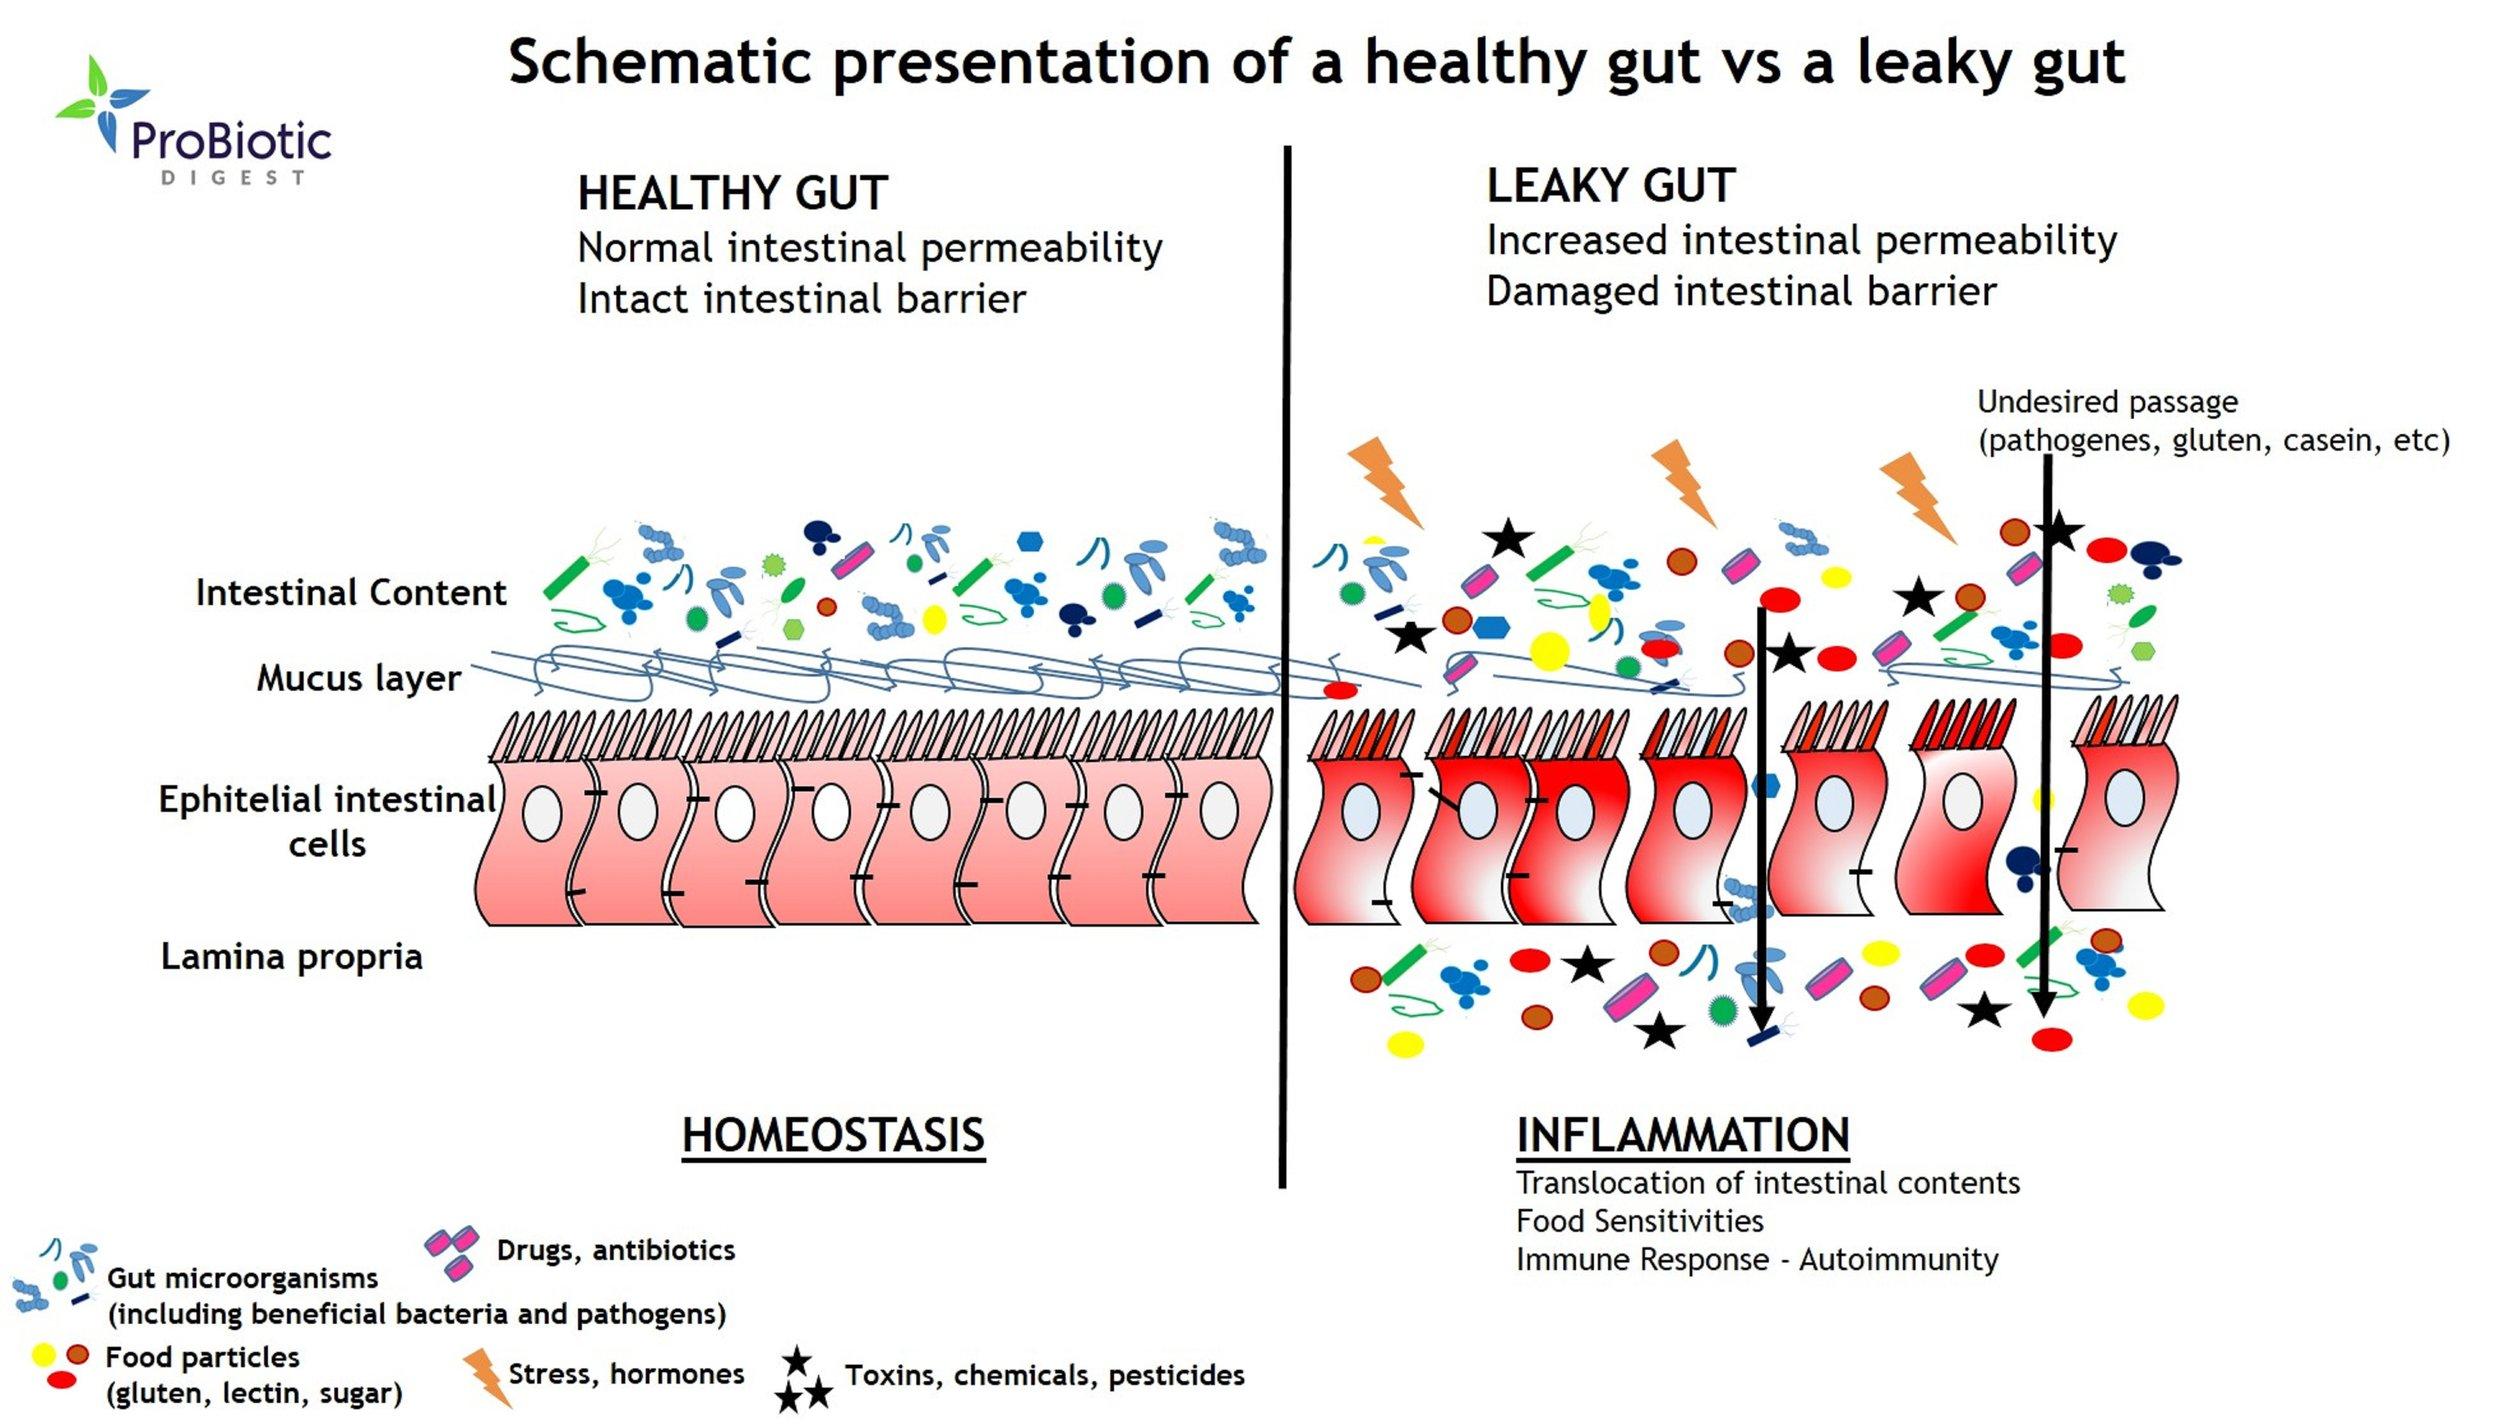 Source: Probiotic Digest